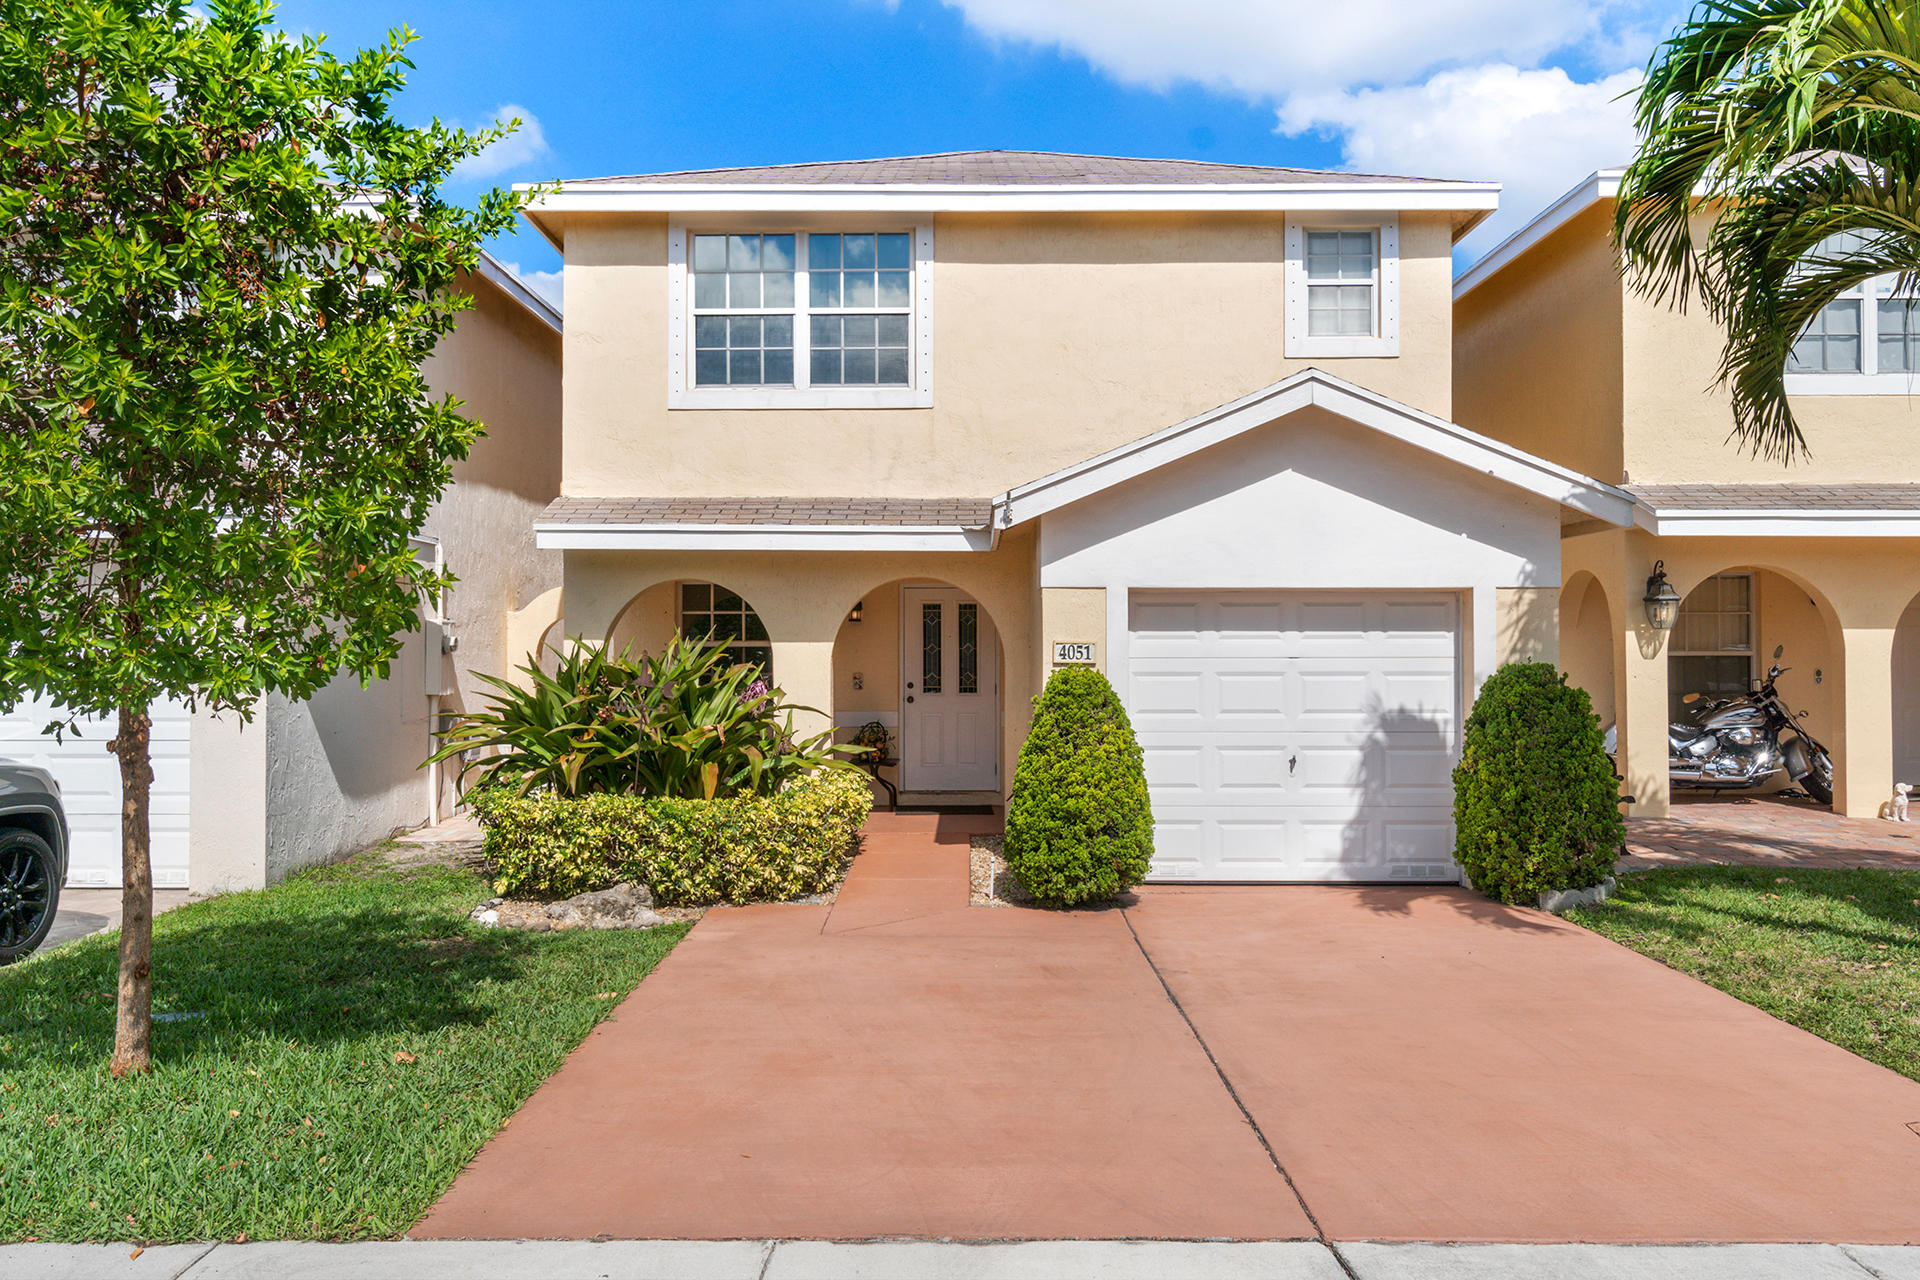 Home for sale in Eastridge Deerfield Beach Florida